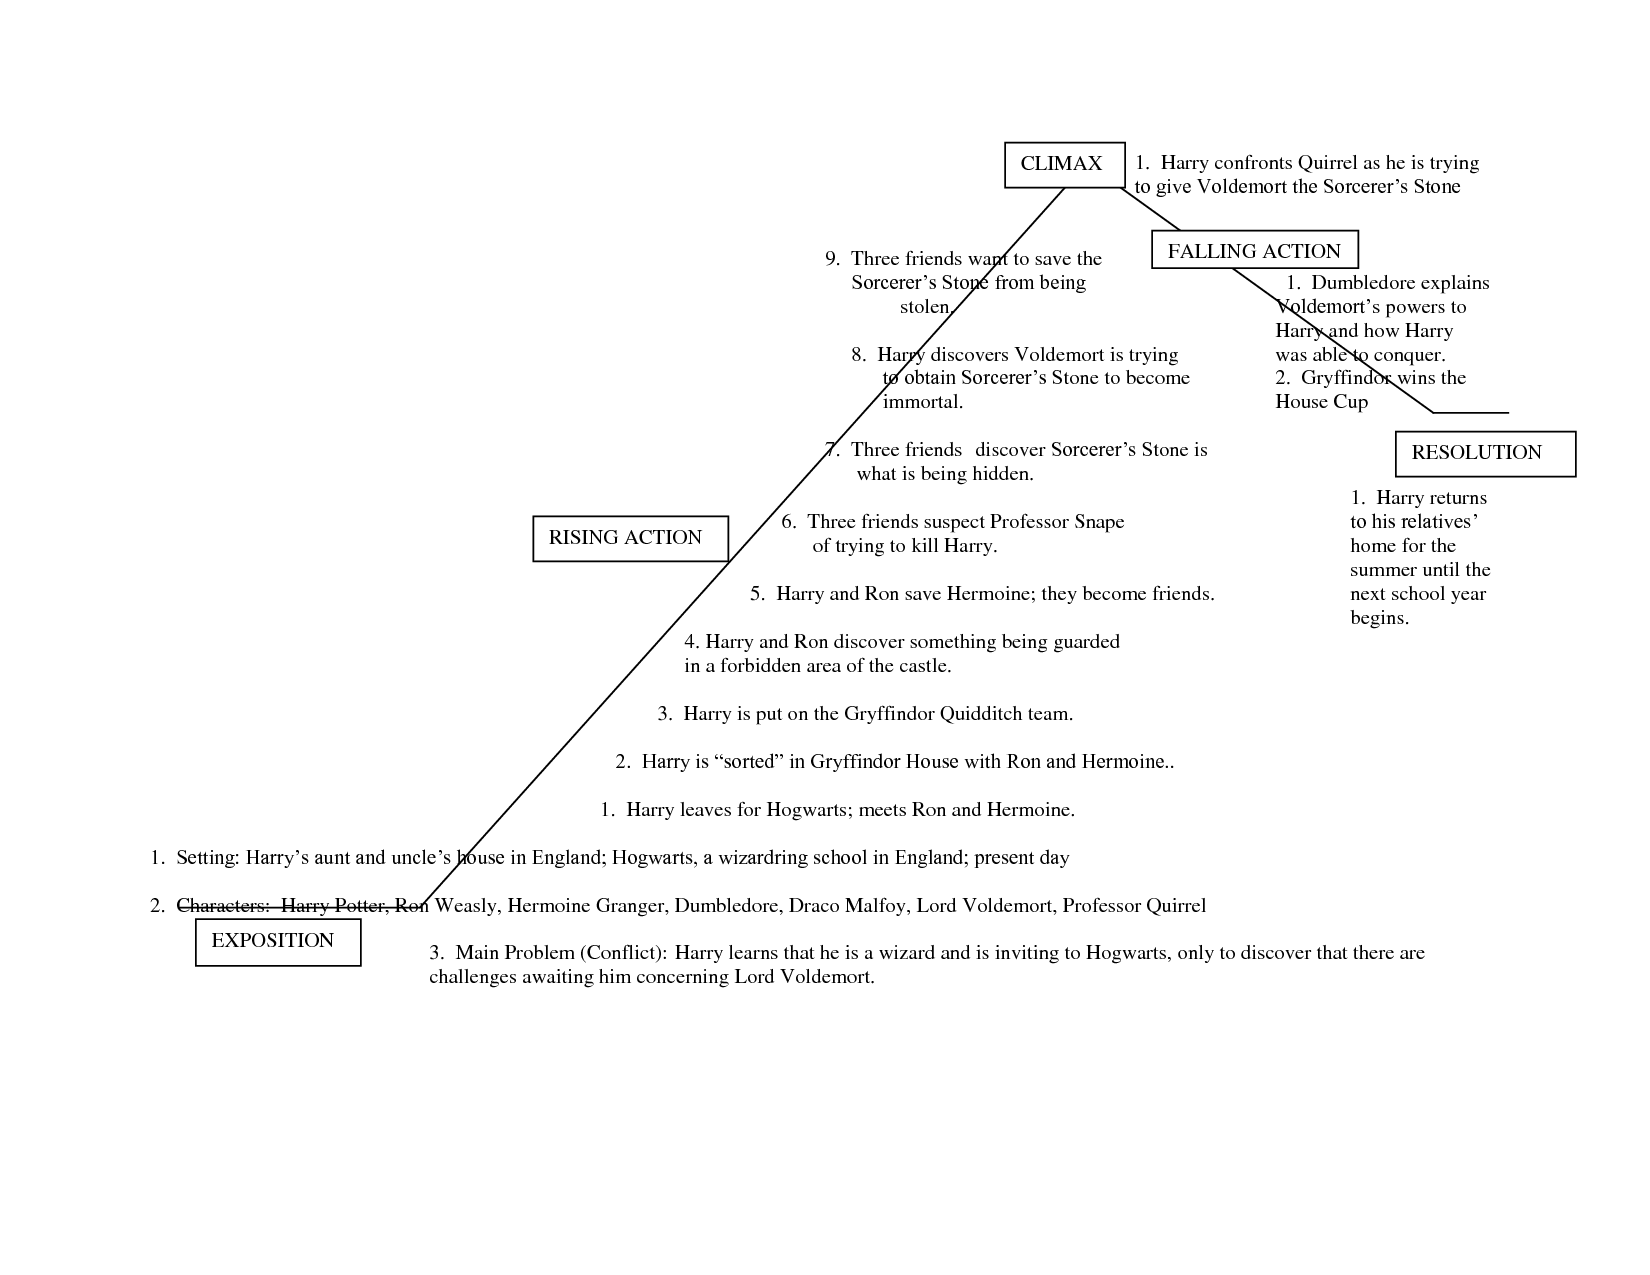 Harry Potter Plot Diagram Wiring Diagrams Diesel Tach Http Wwwbenzworldorg Forums W123ecedcdtd